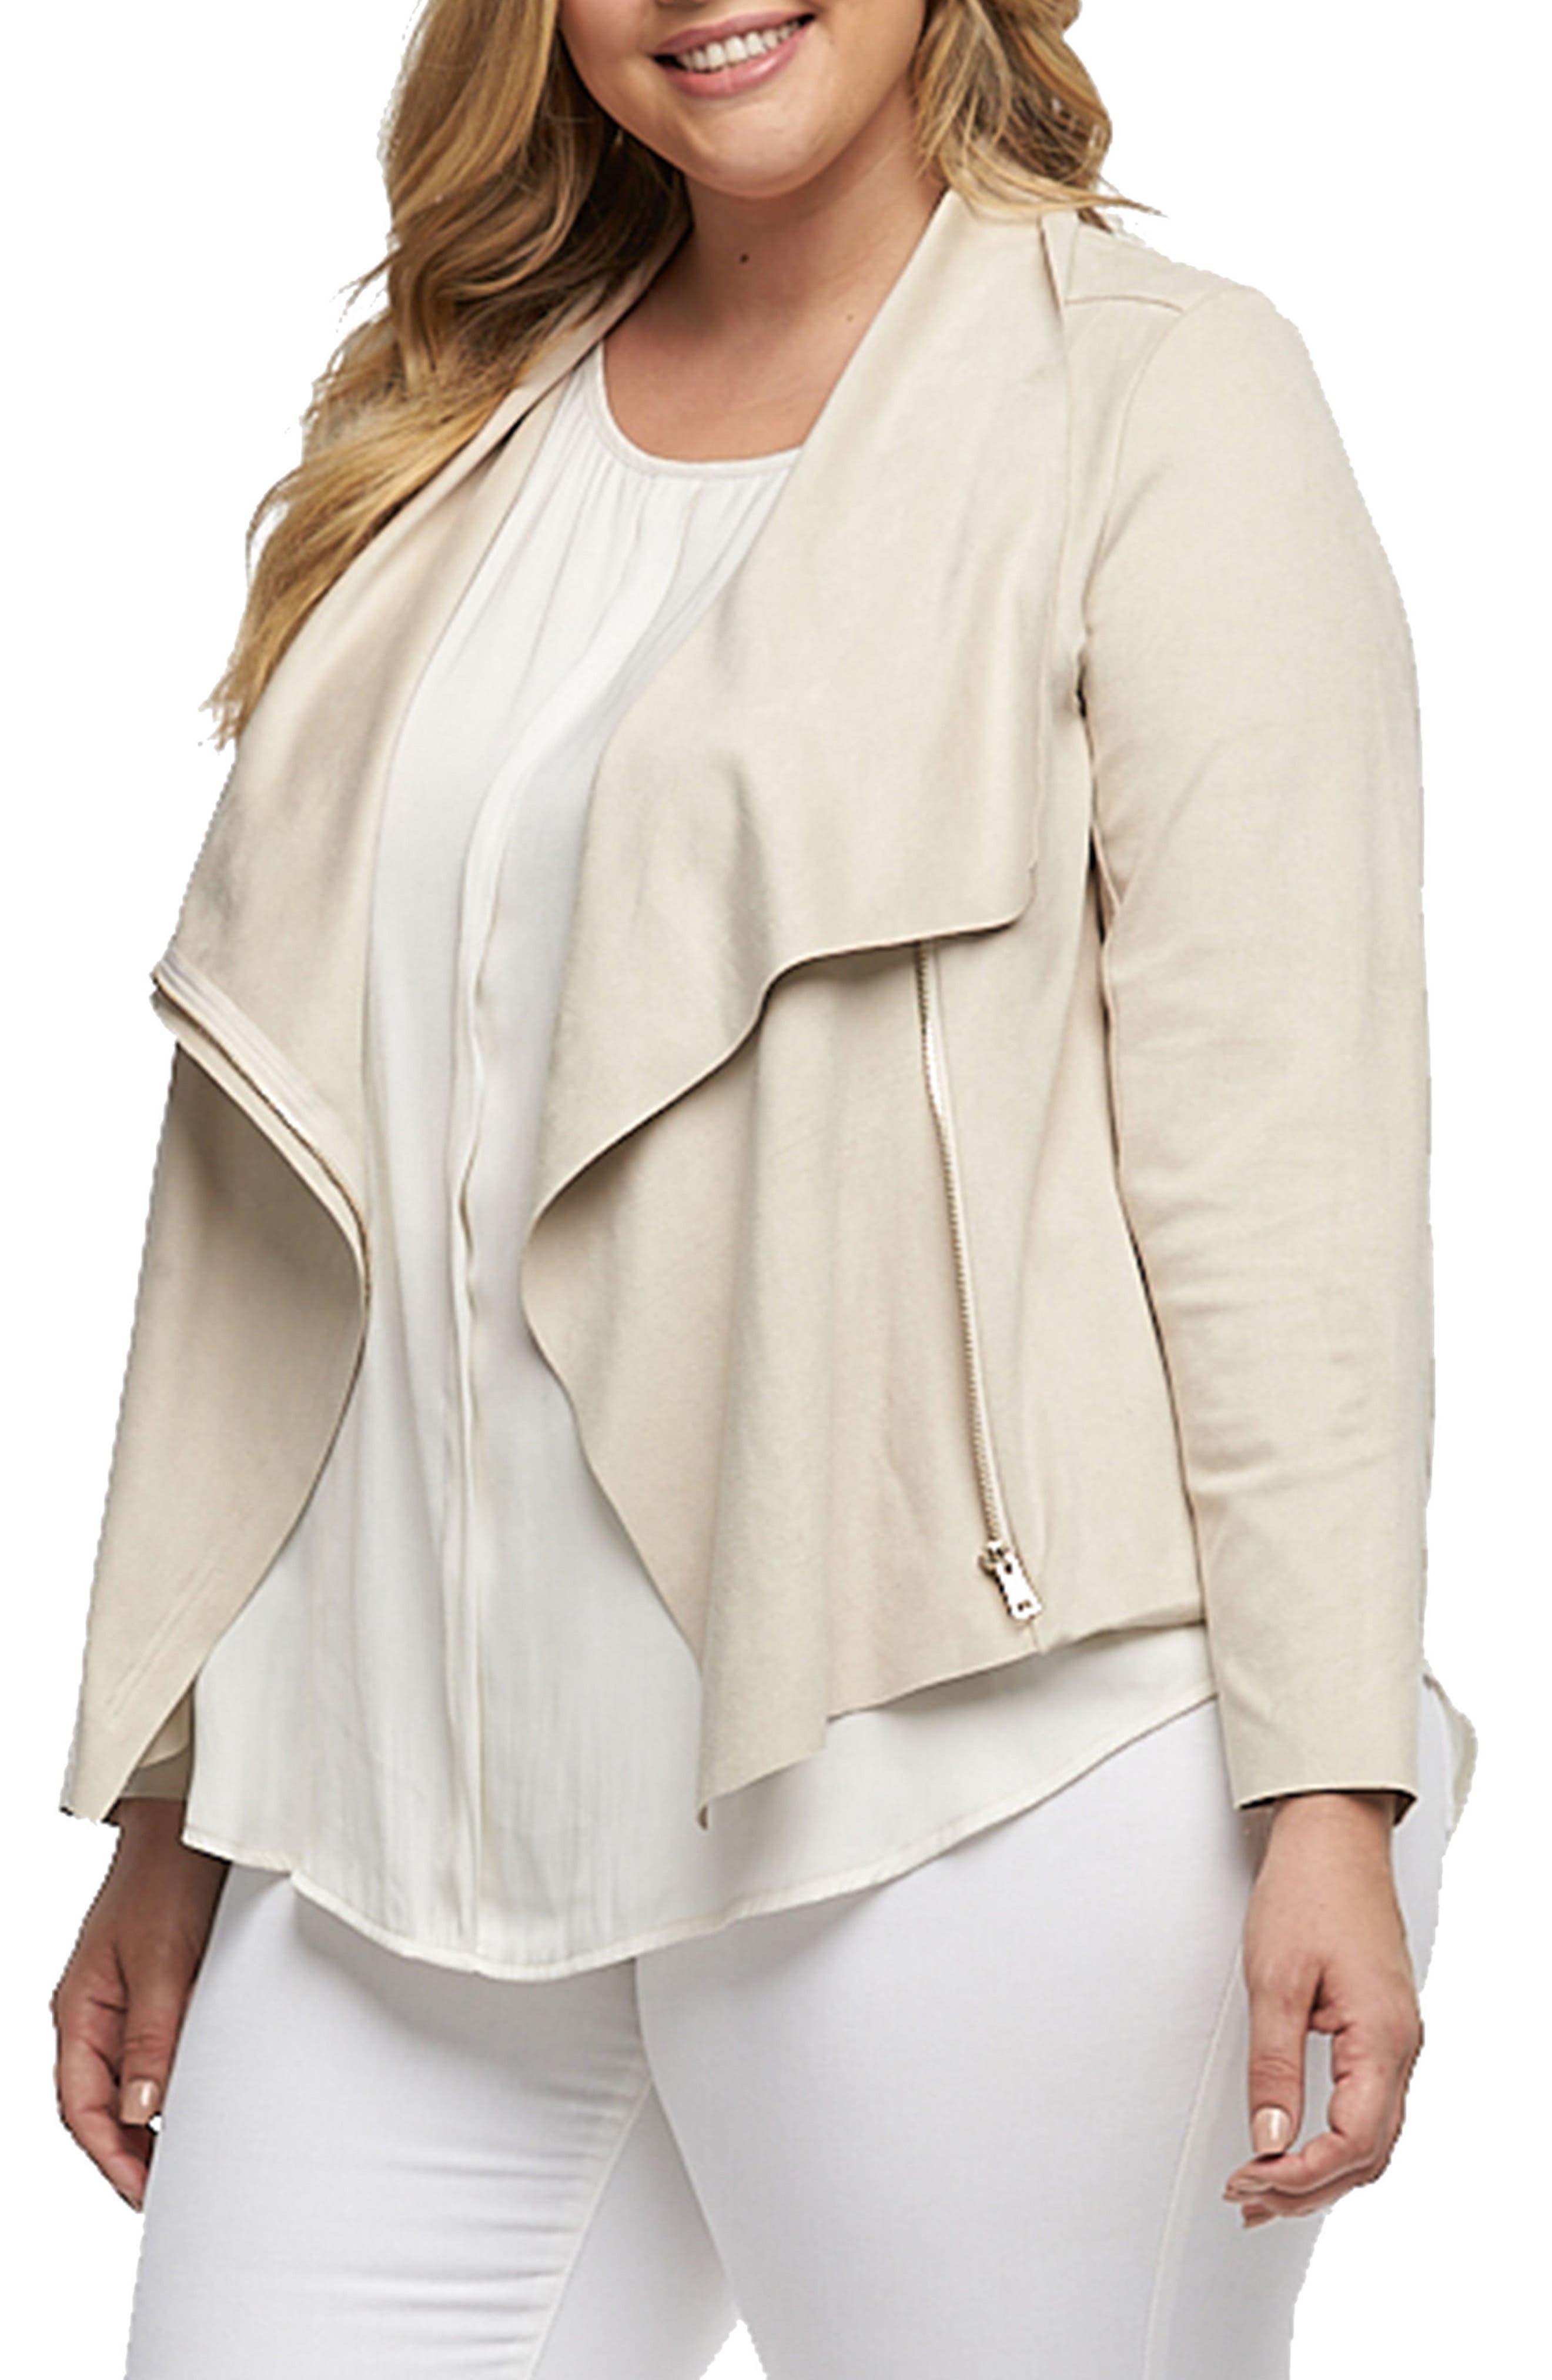 Sayna Drape Front Asymmetrical Jacket,                             Alternate thumbnail 3, color,                             900